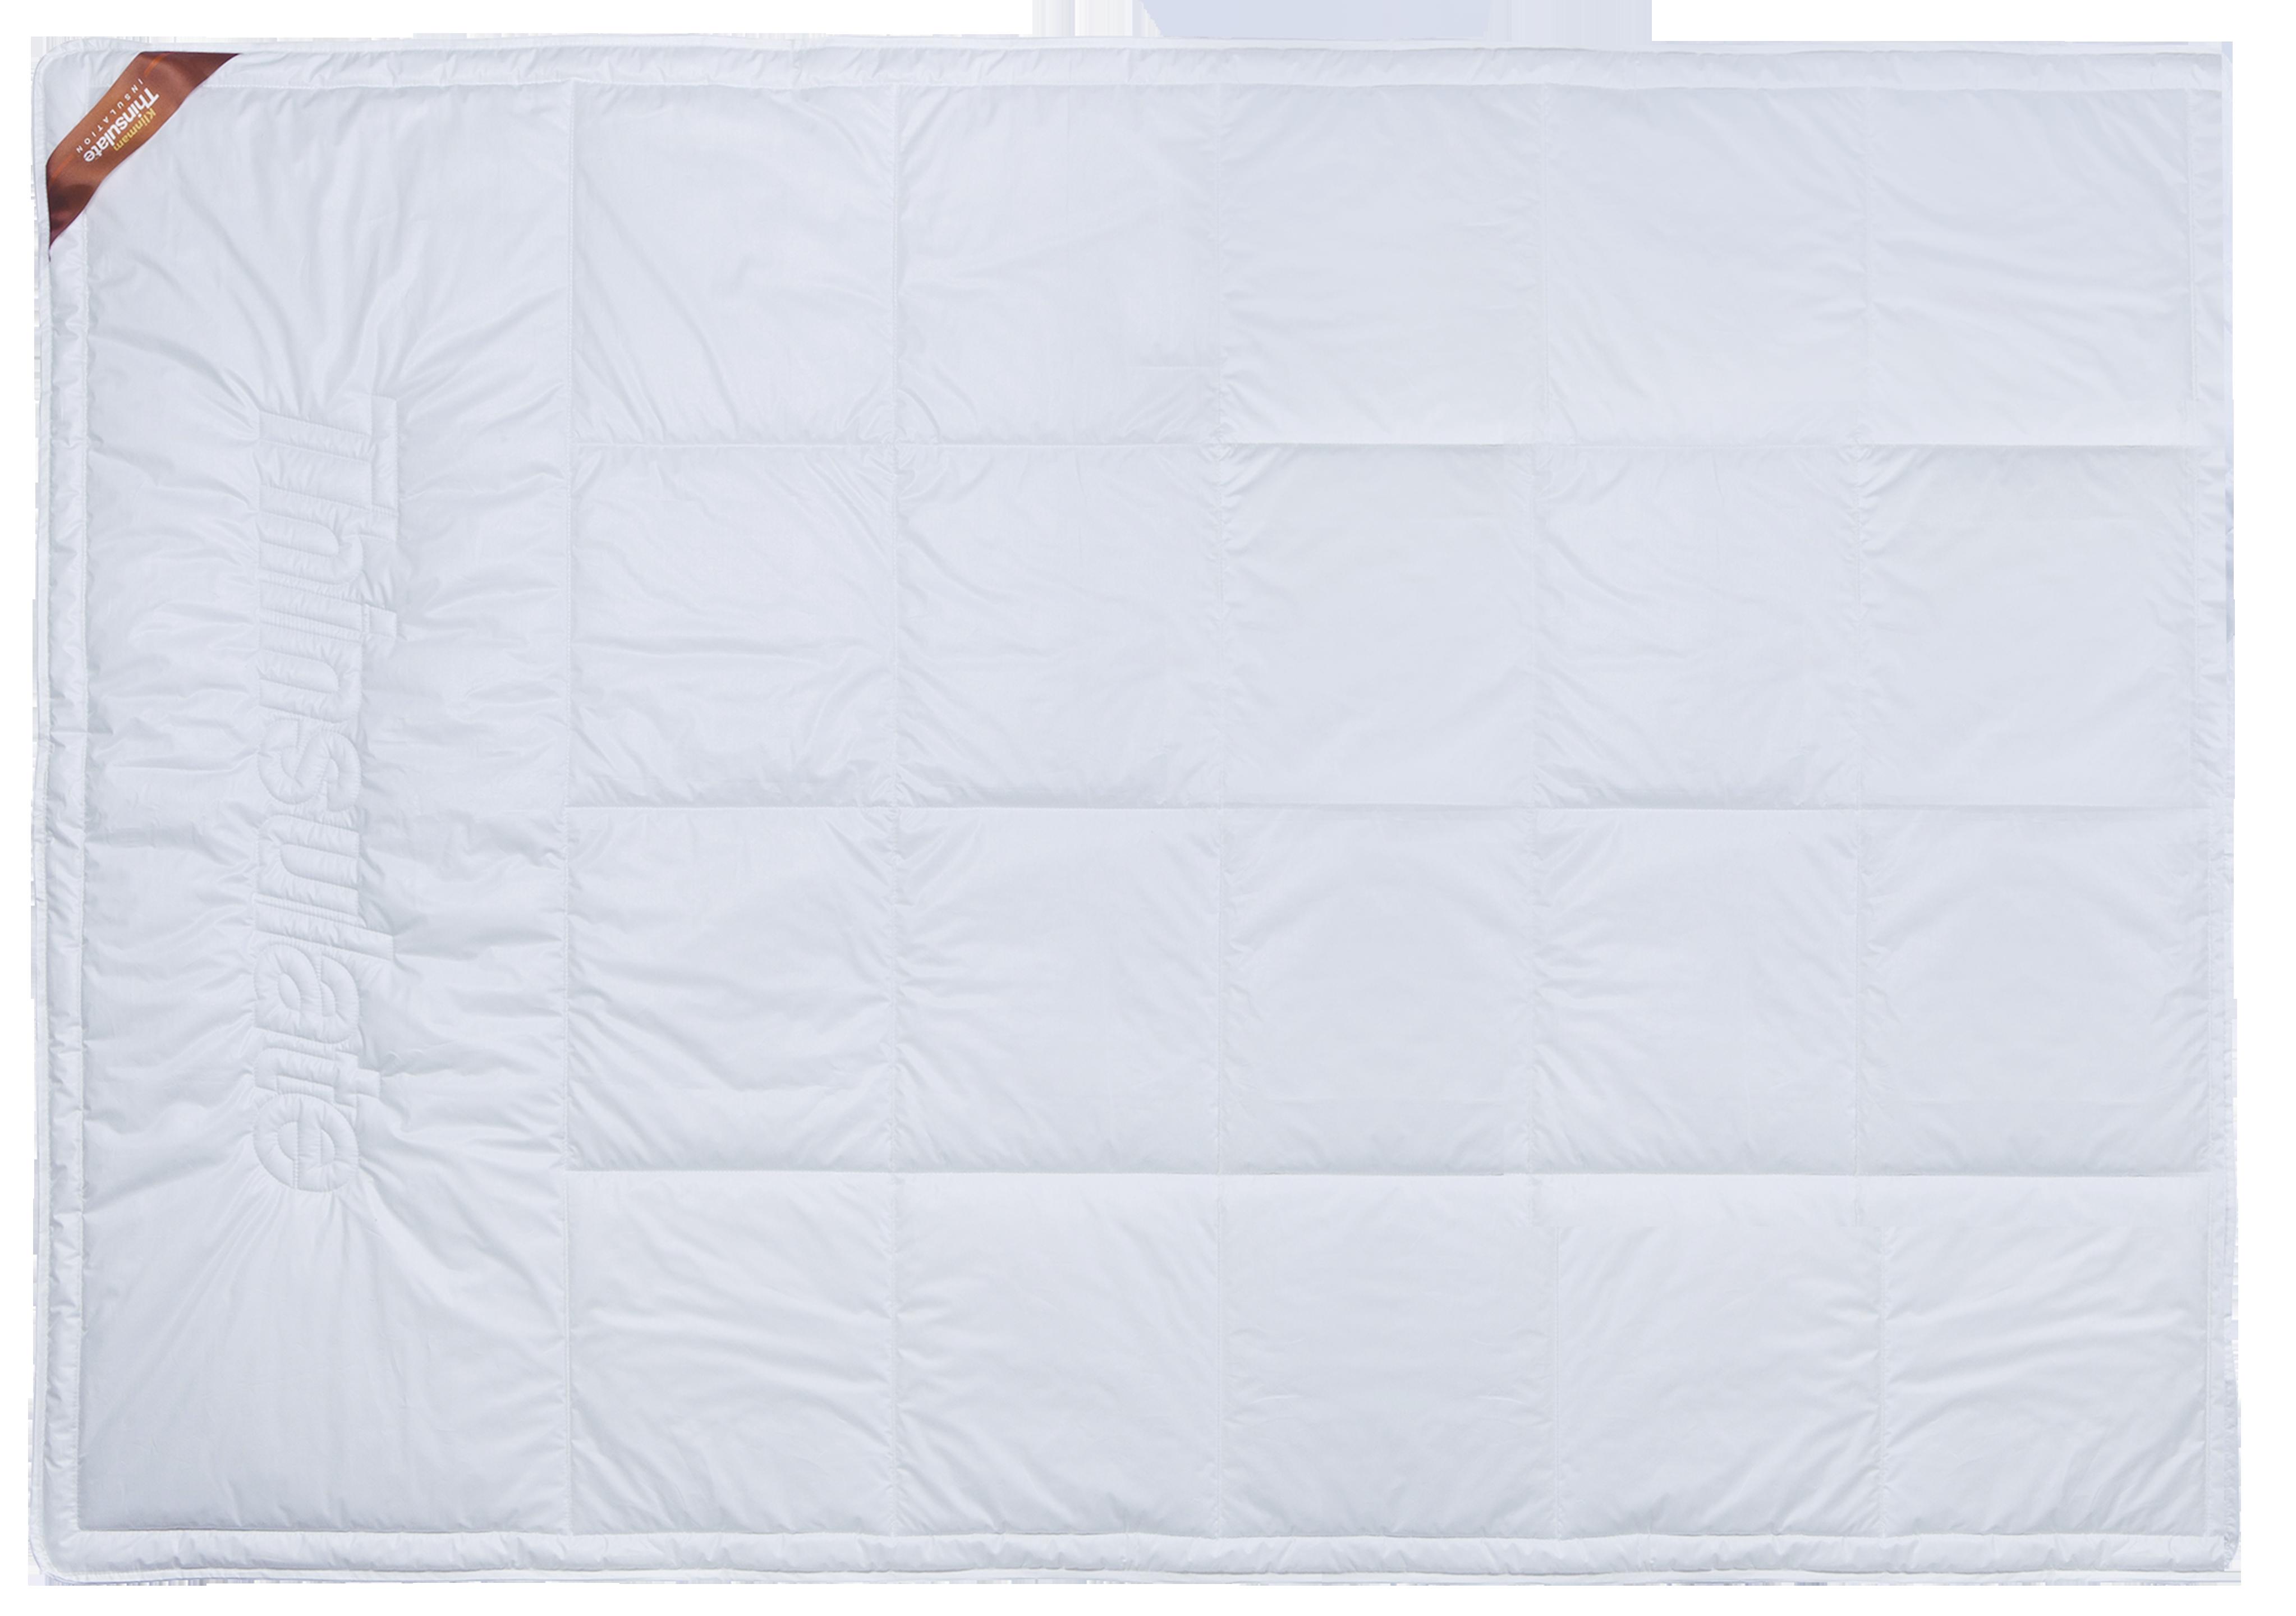 Thinsulate Přikrývka - 135 x 200 cm - Klinmam